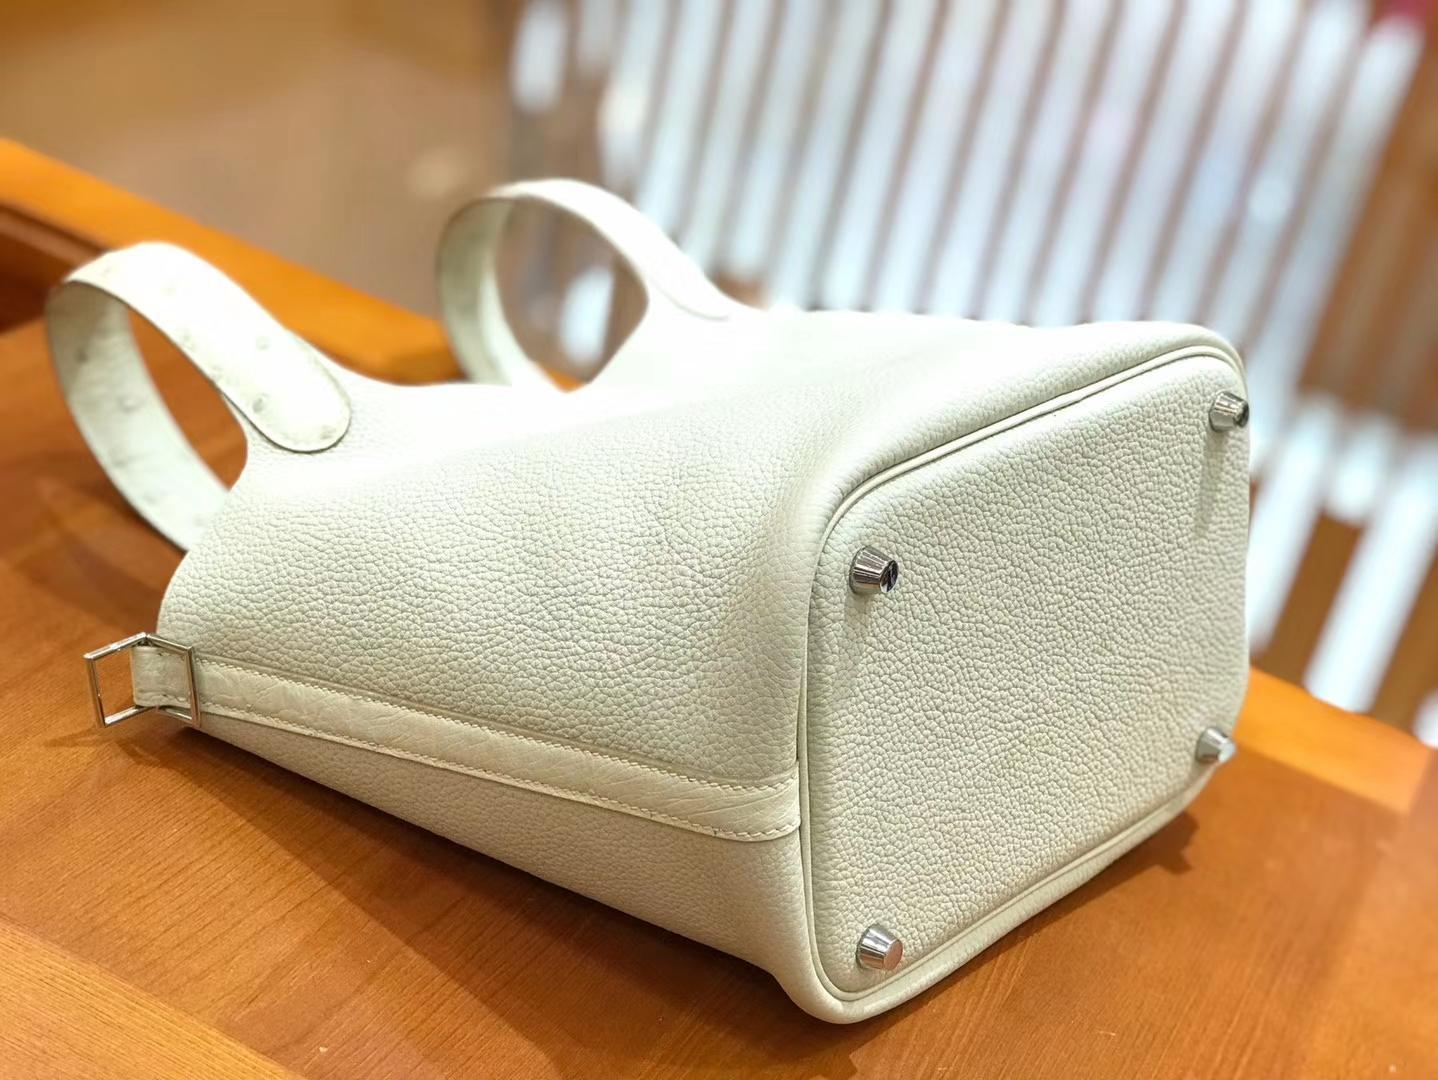 Hermès(爱马仕)Piction 18cm 奶昔白 银扣 鸵鸟皮拼小牛皮 全手工缝制